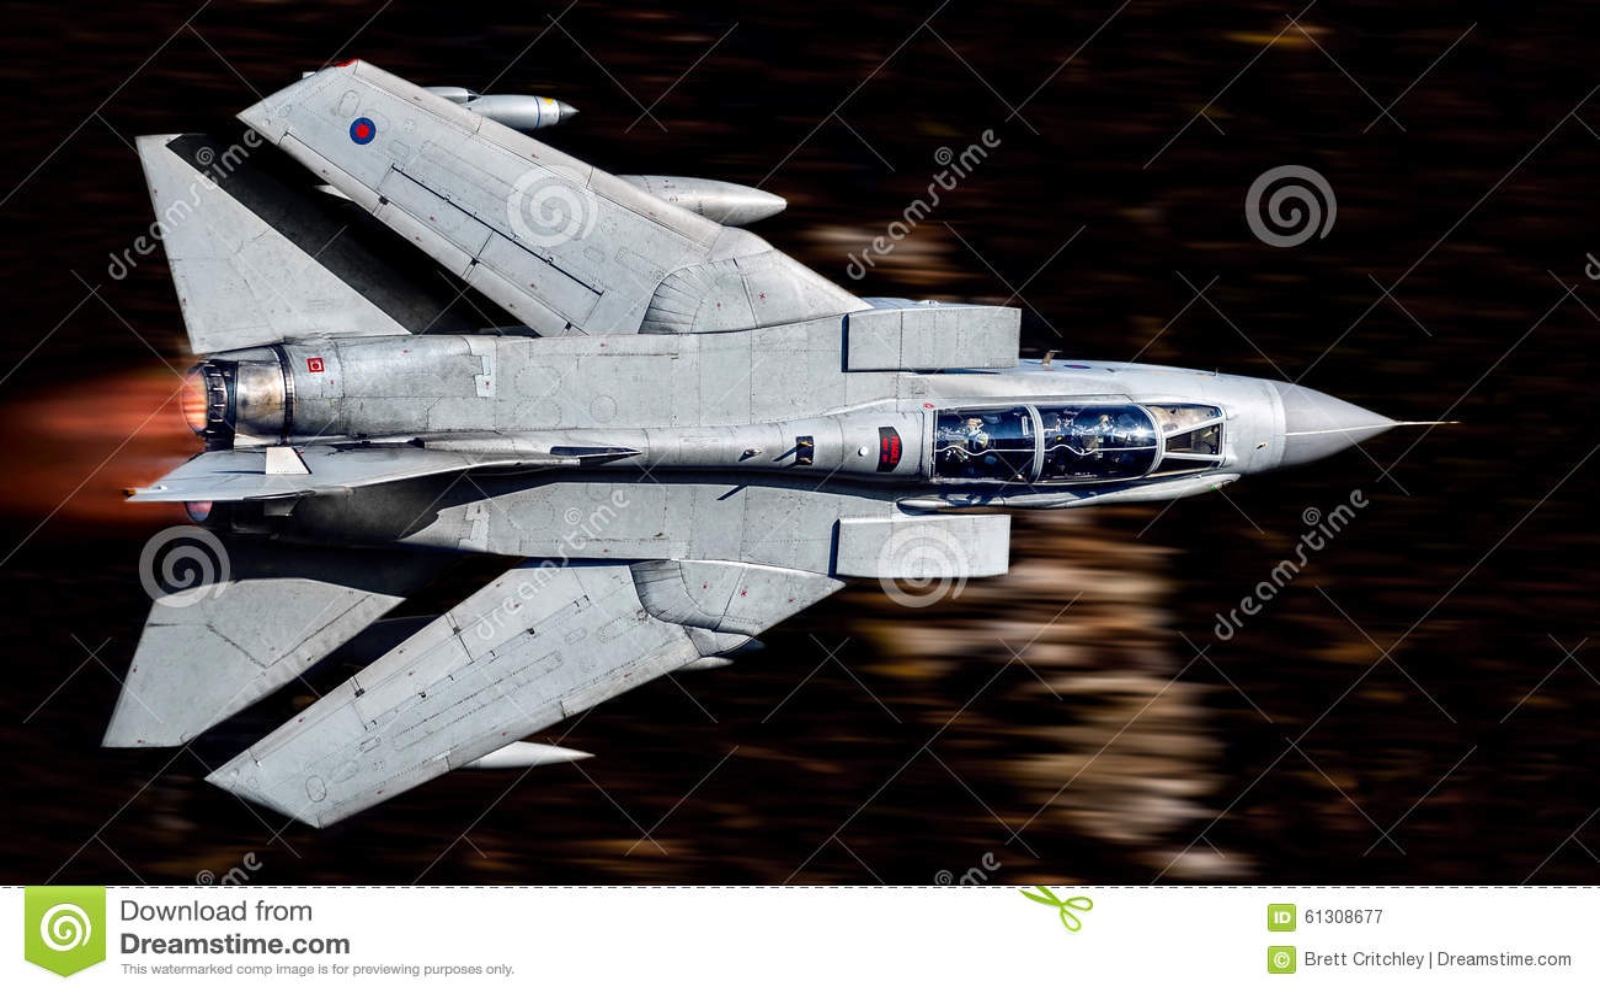 Military aircraft jet